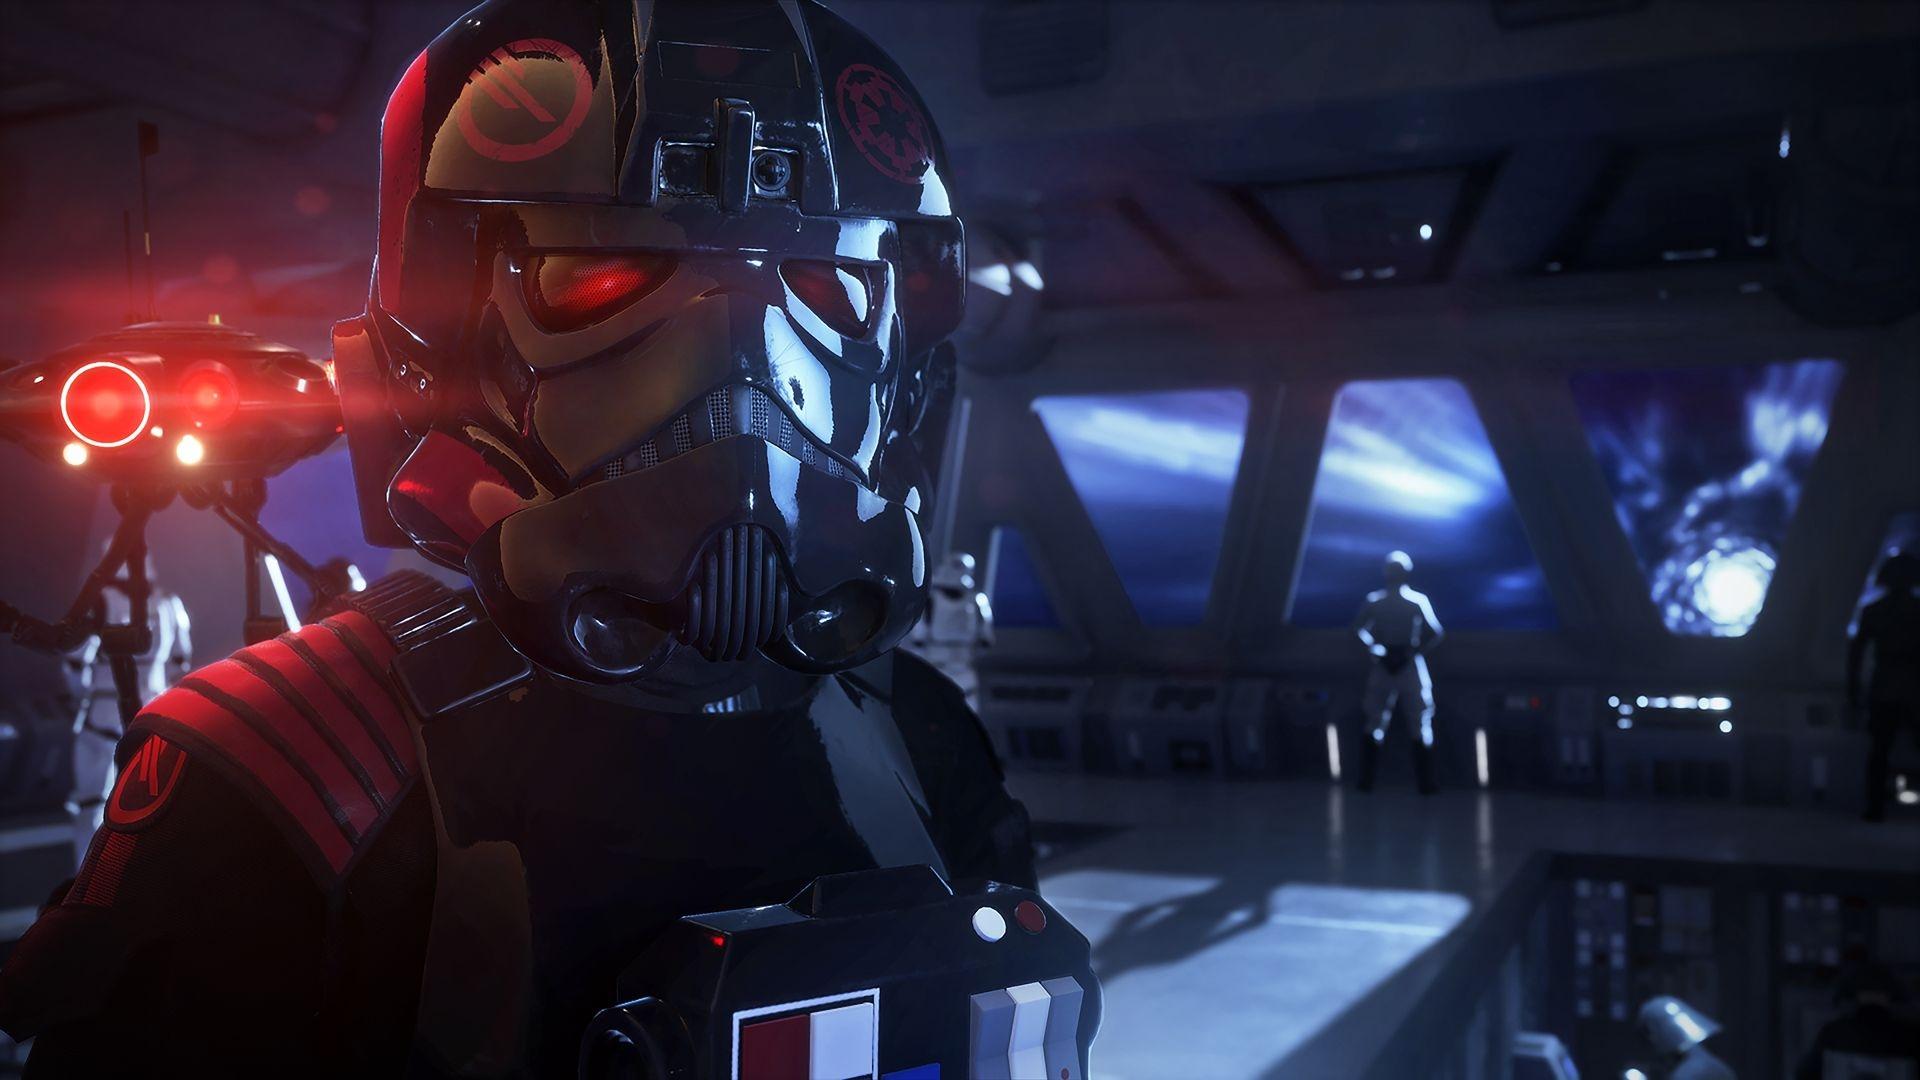 Star Wars Battlefront 2 (2017) (PC) - Origin Key - GLOBAL - 4